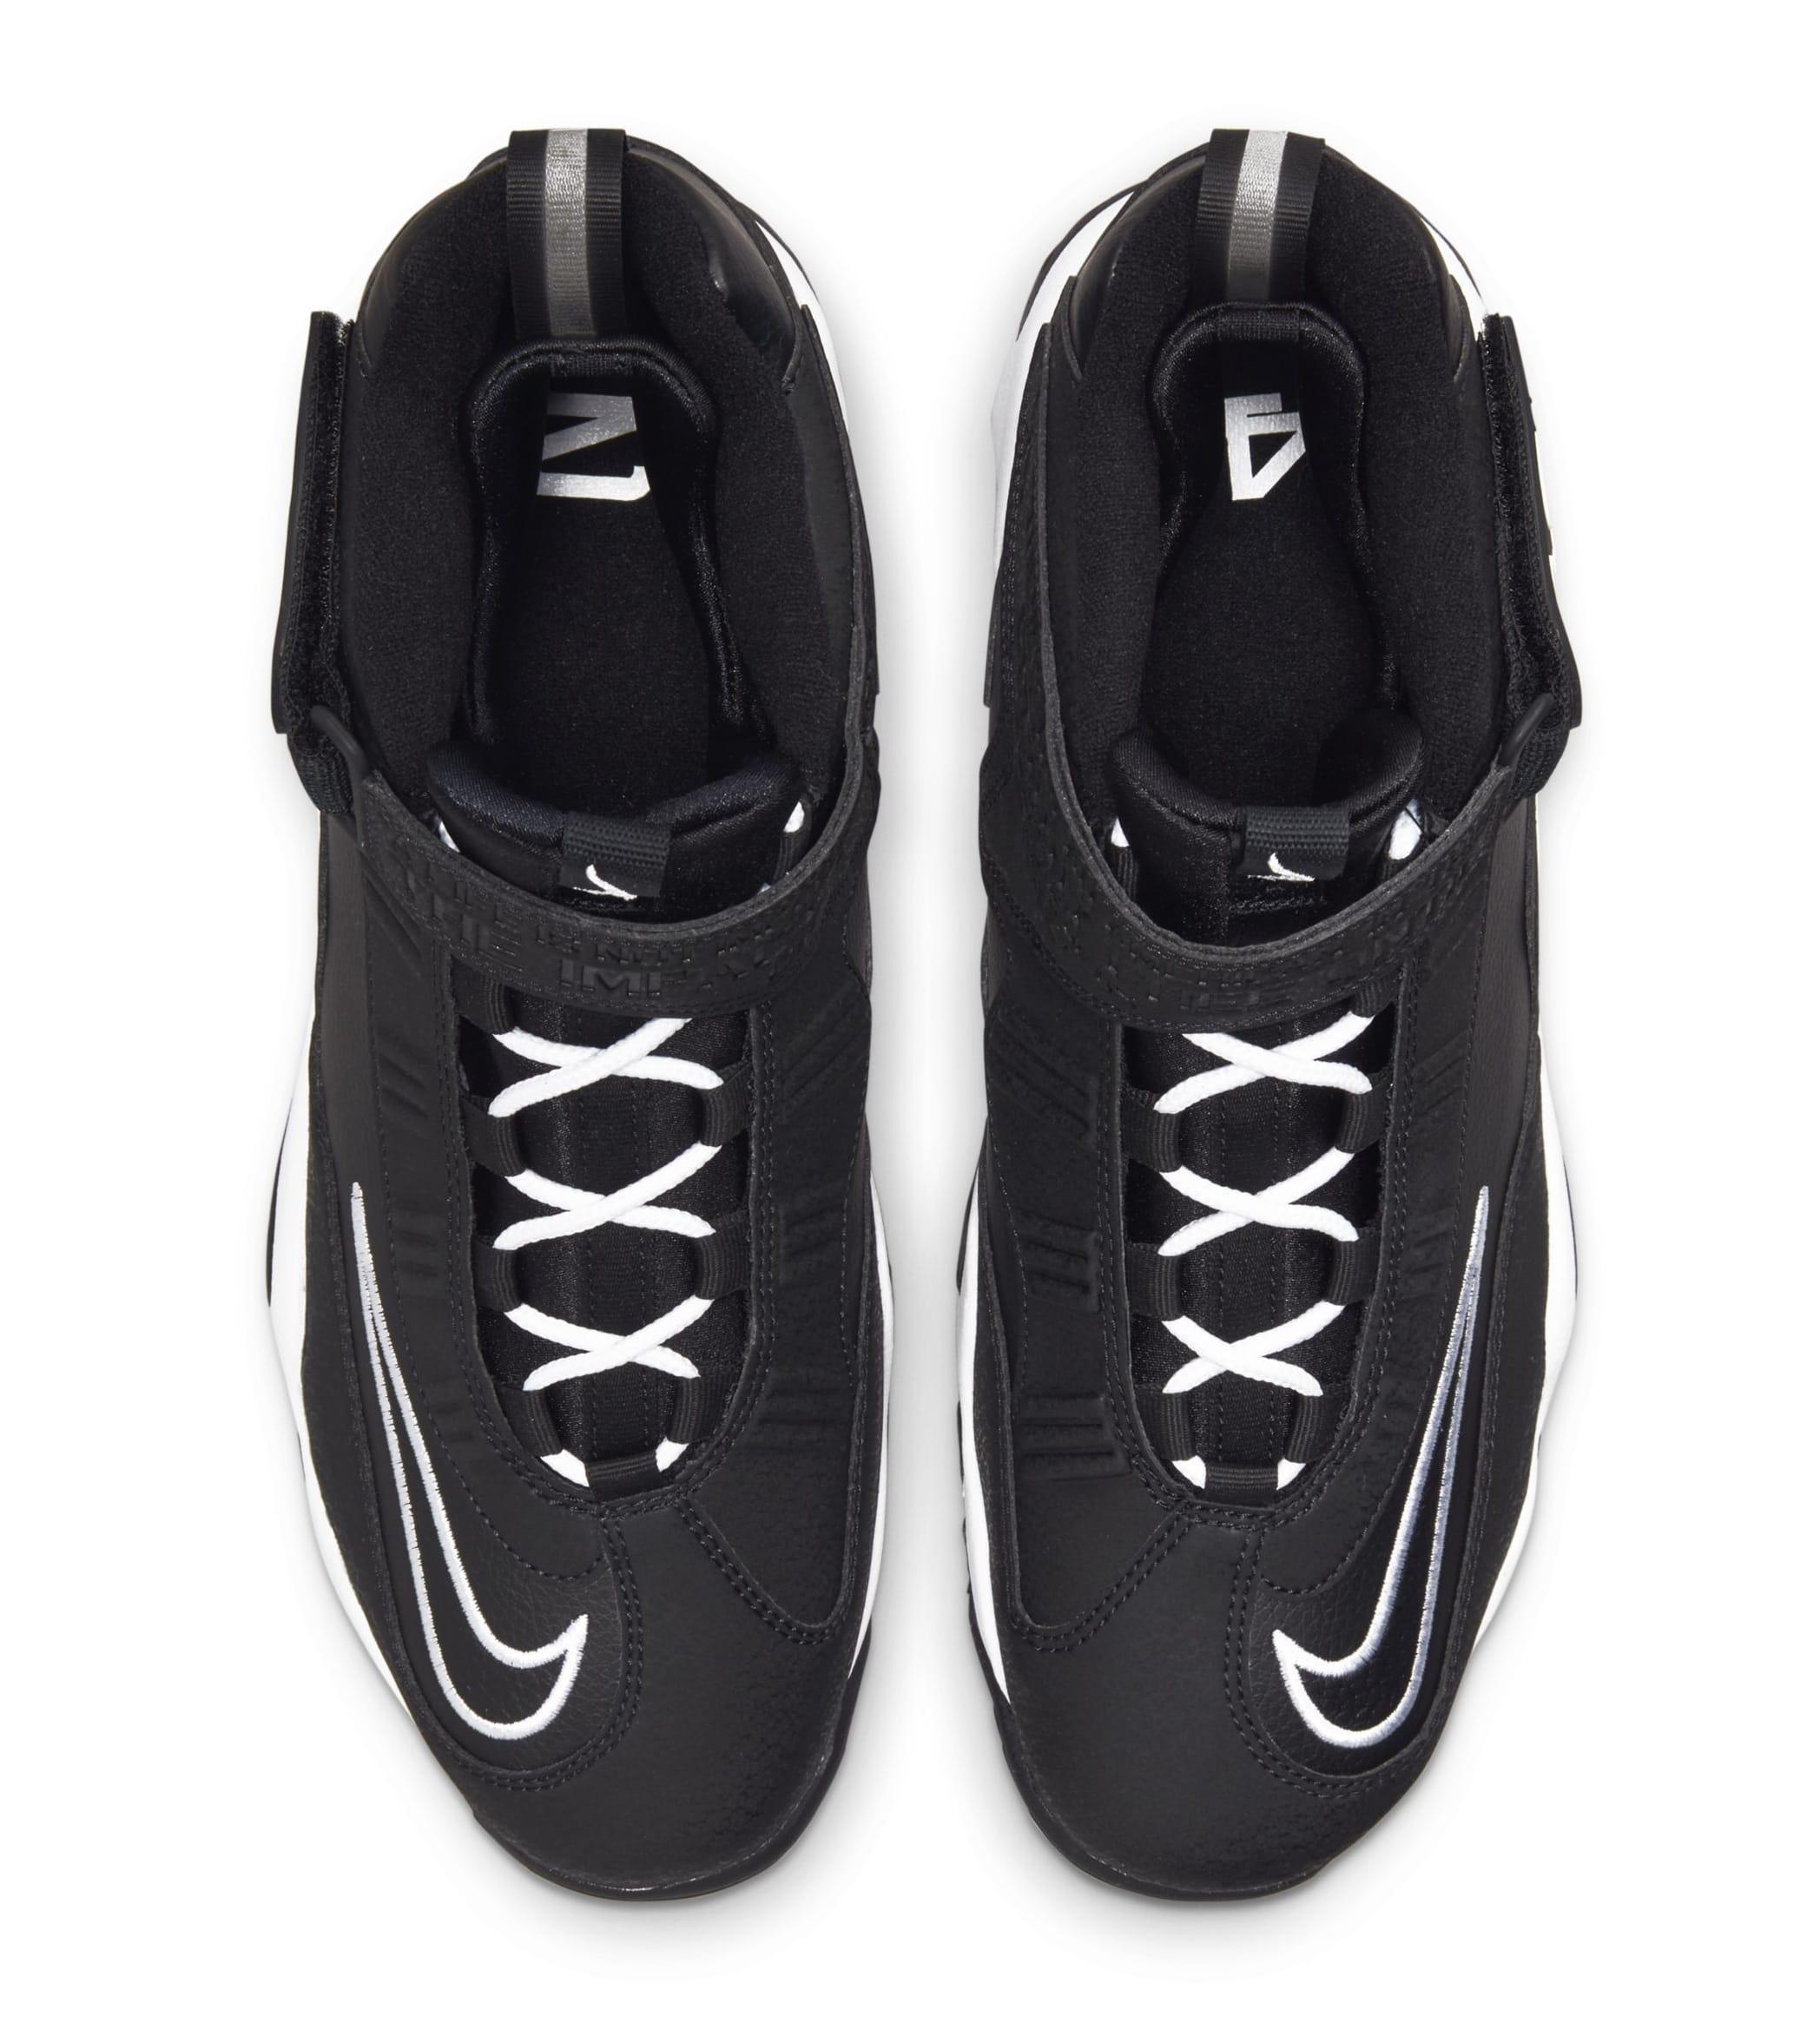 Nike Air Griffey Max 1 'Jackie Robinson' Top